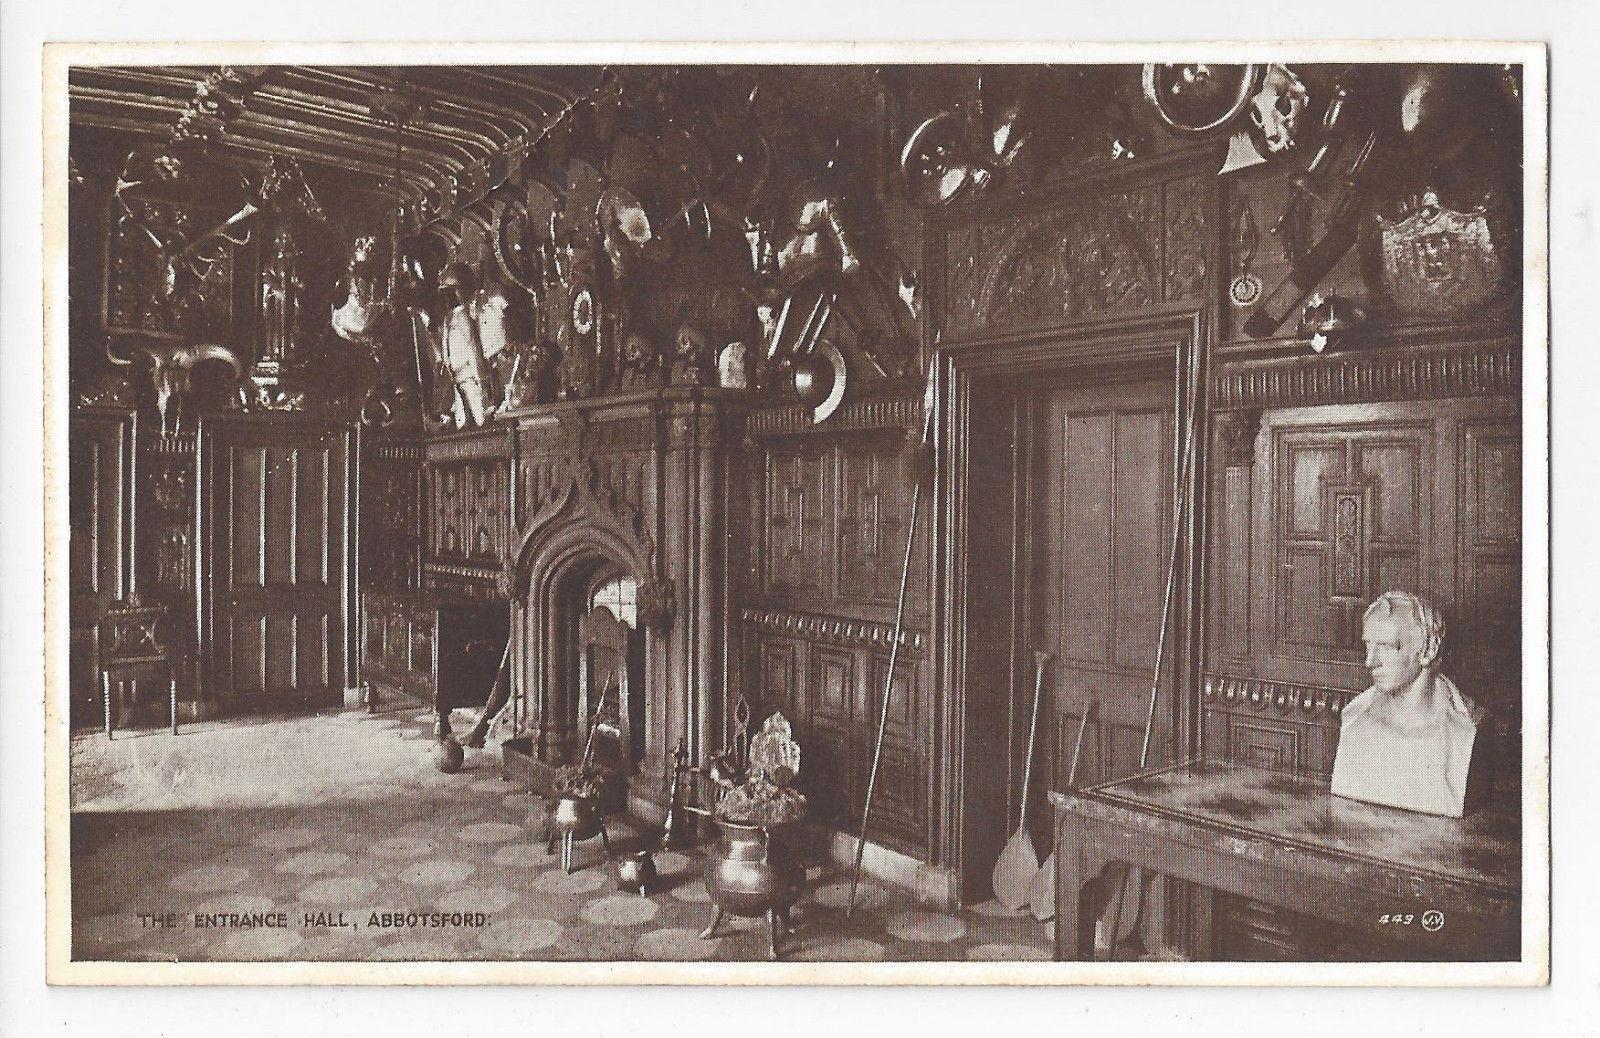 UK Scotland Abbotsford House Entrance Hall Valentines Vintage Postcard